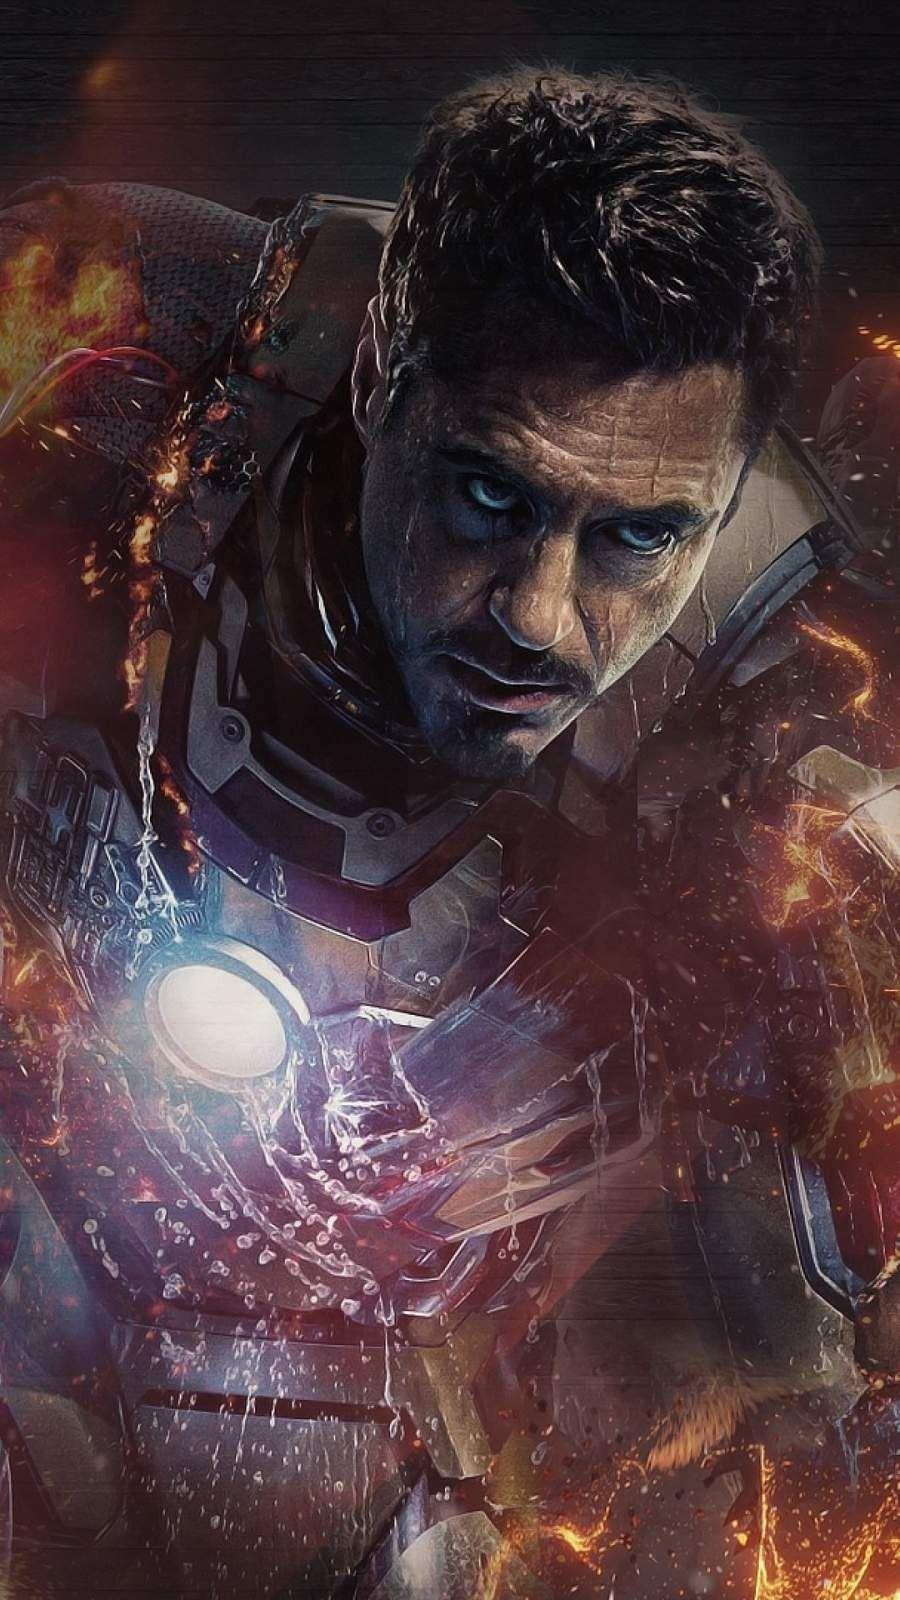 Iron Man 4k Iphone Mark 50 Wallpaper Iron Man Avengers Iron Man Movie Marvel Iron Man Iphone ultra hd avengers endgame iron